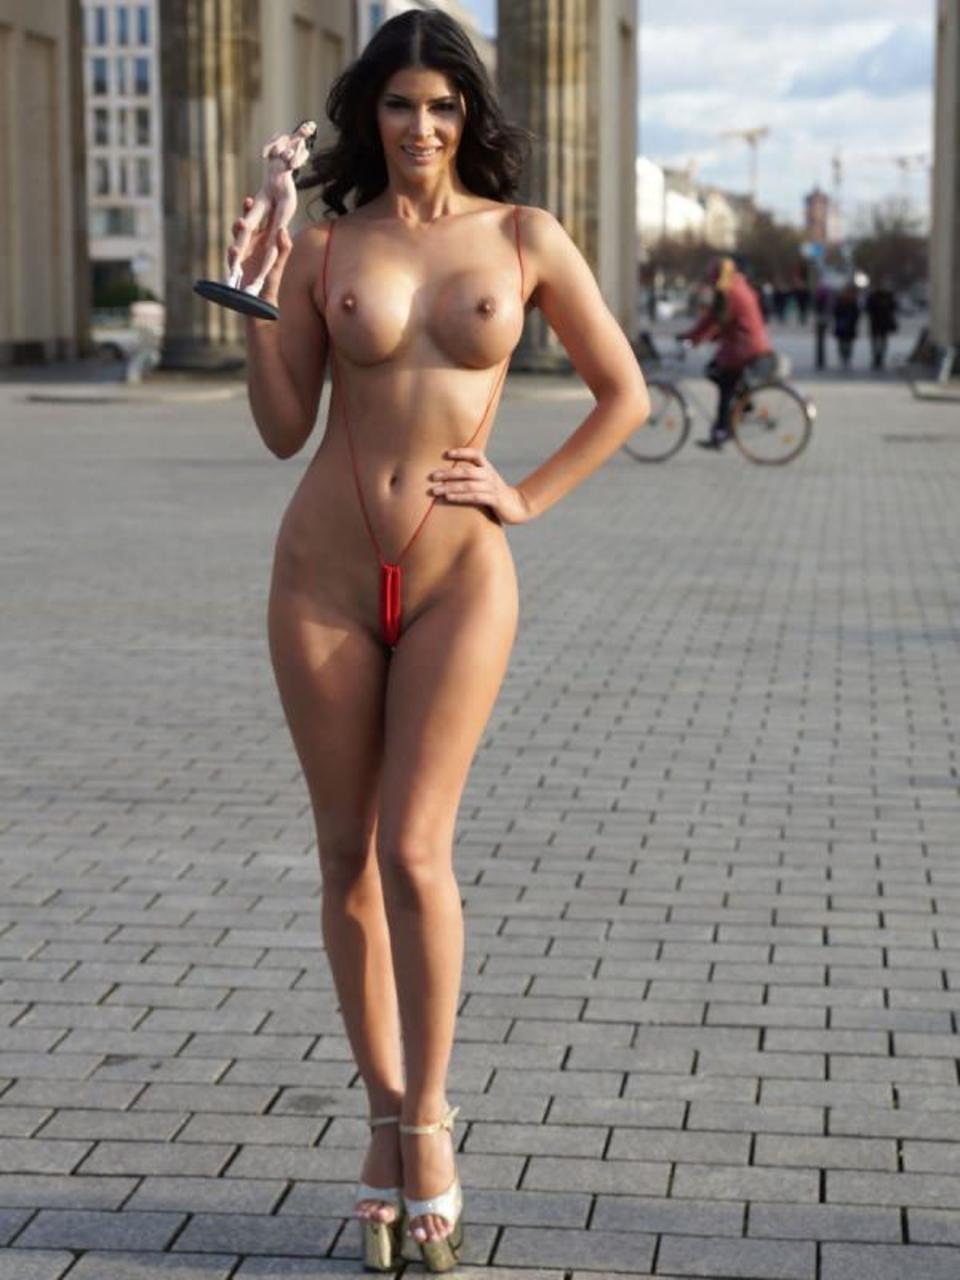 Sexy Public Half Topless 98